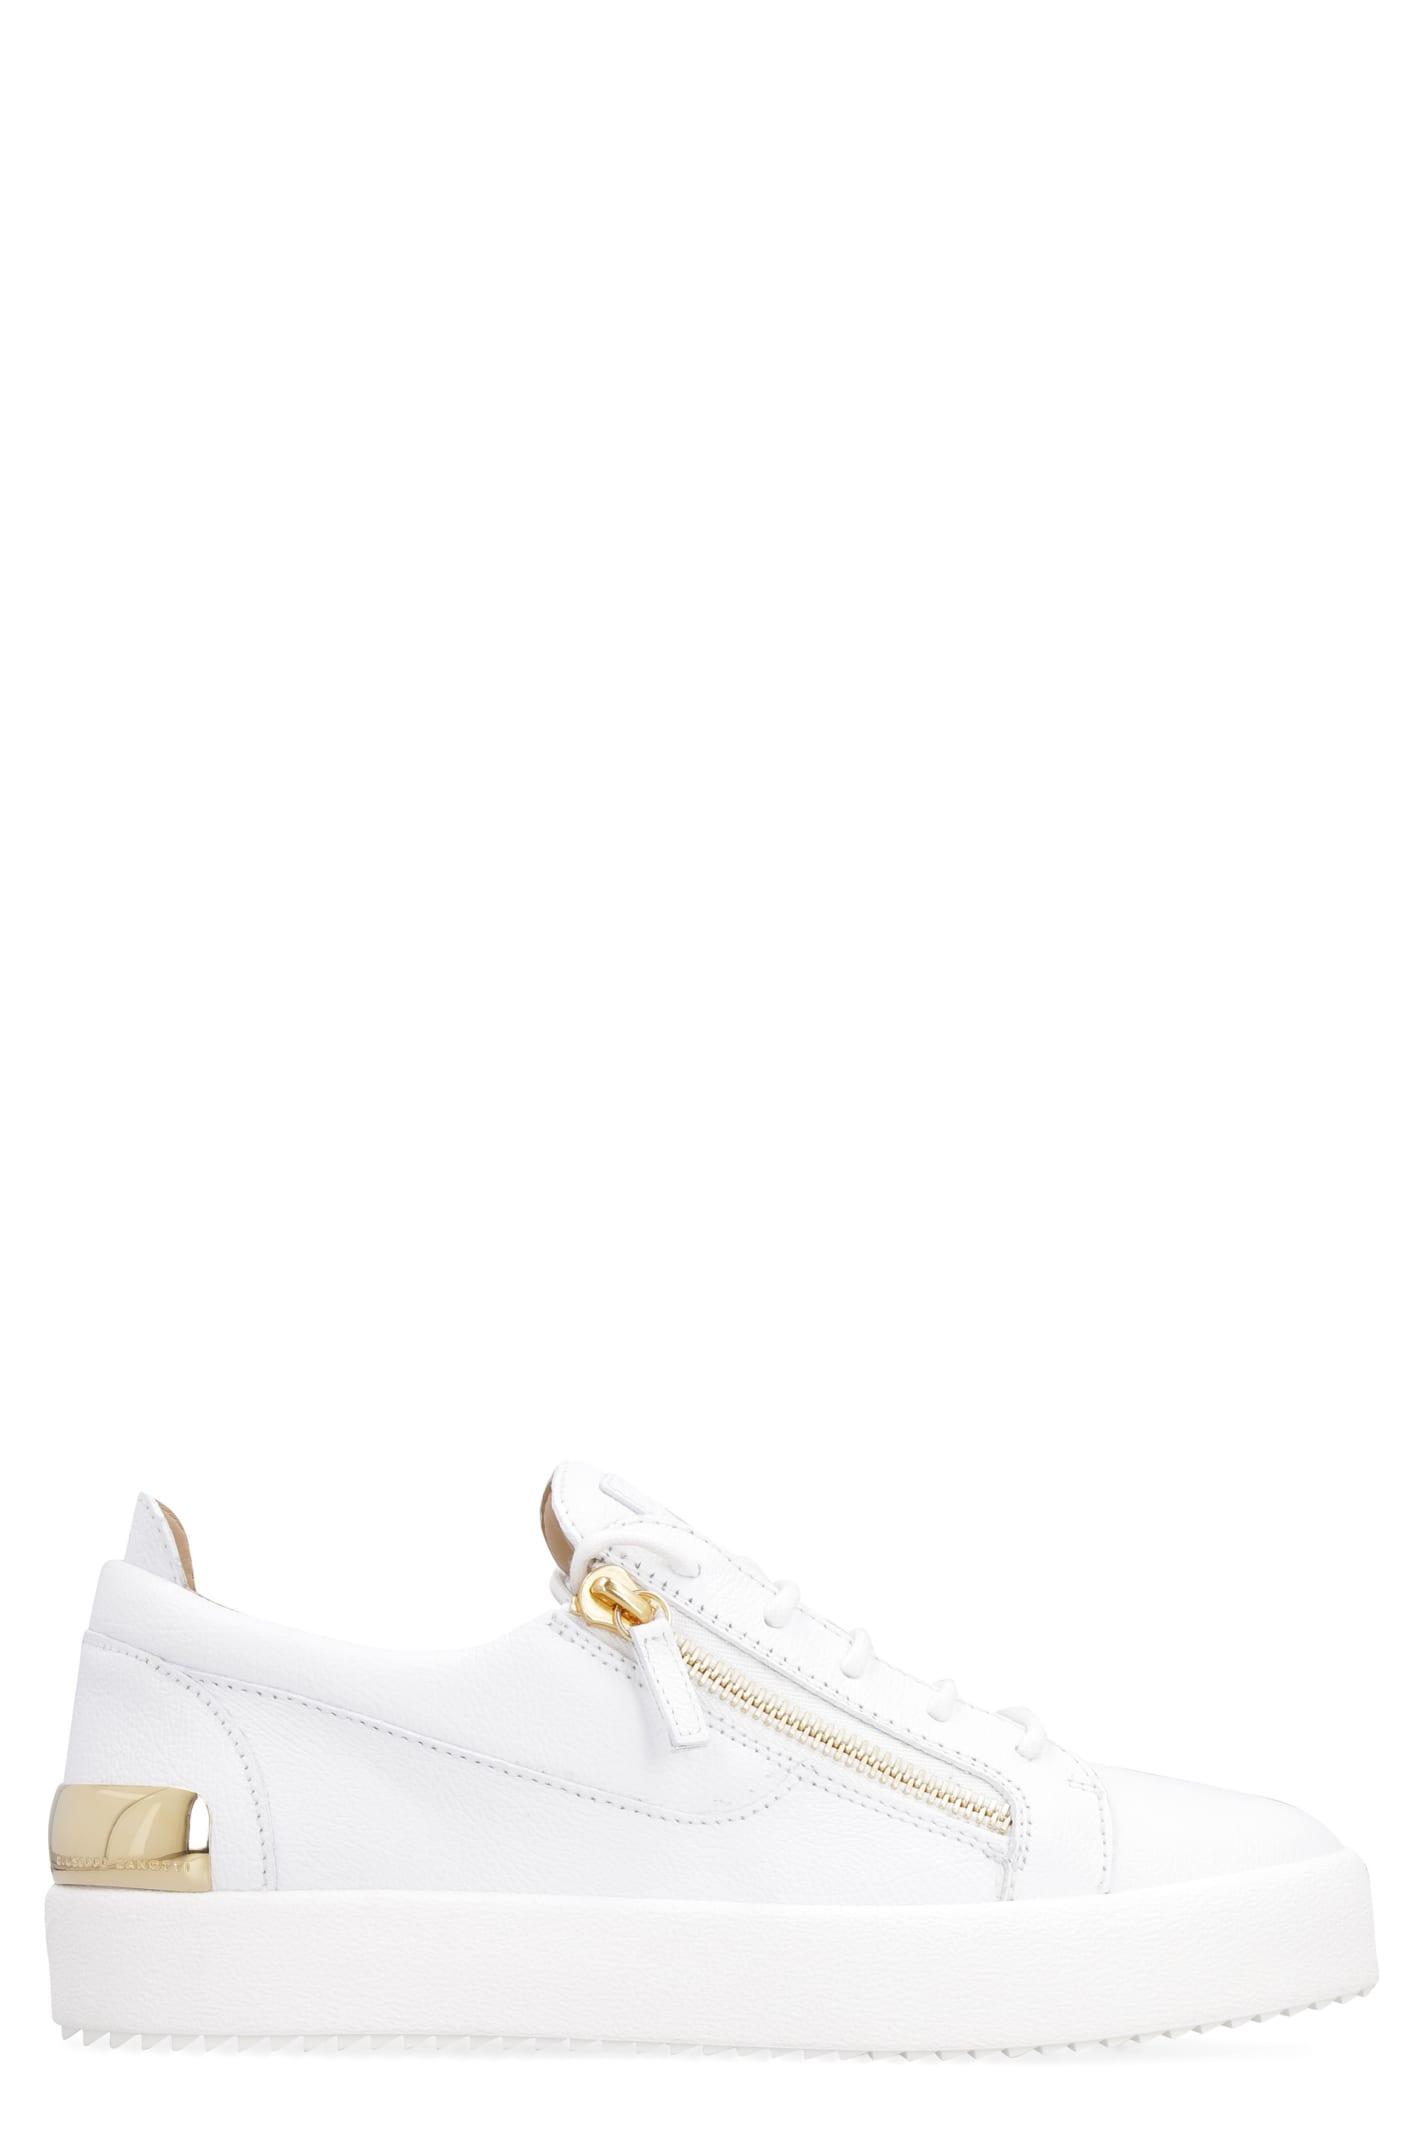 Giuseppe Zanotti Frankie Leather Low-top Sneakers